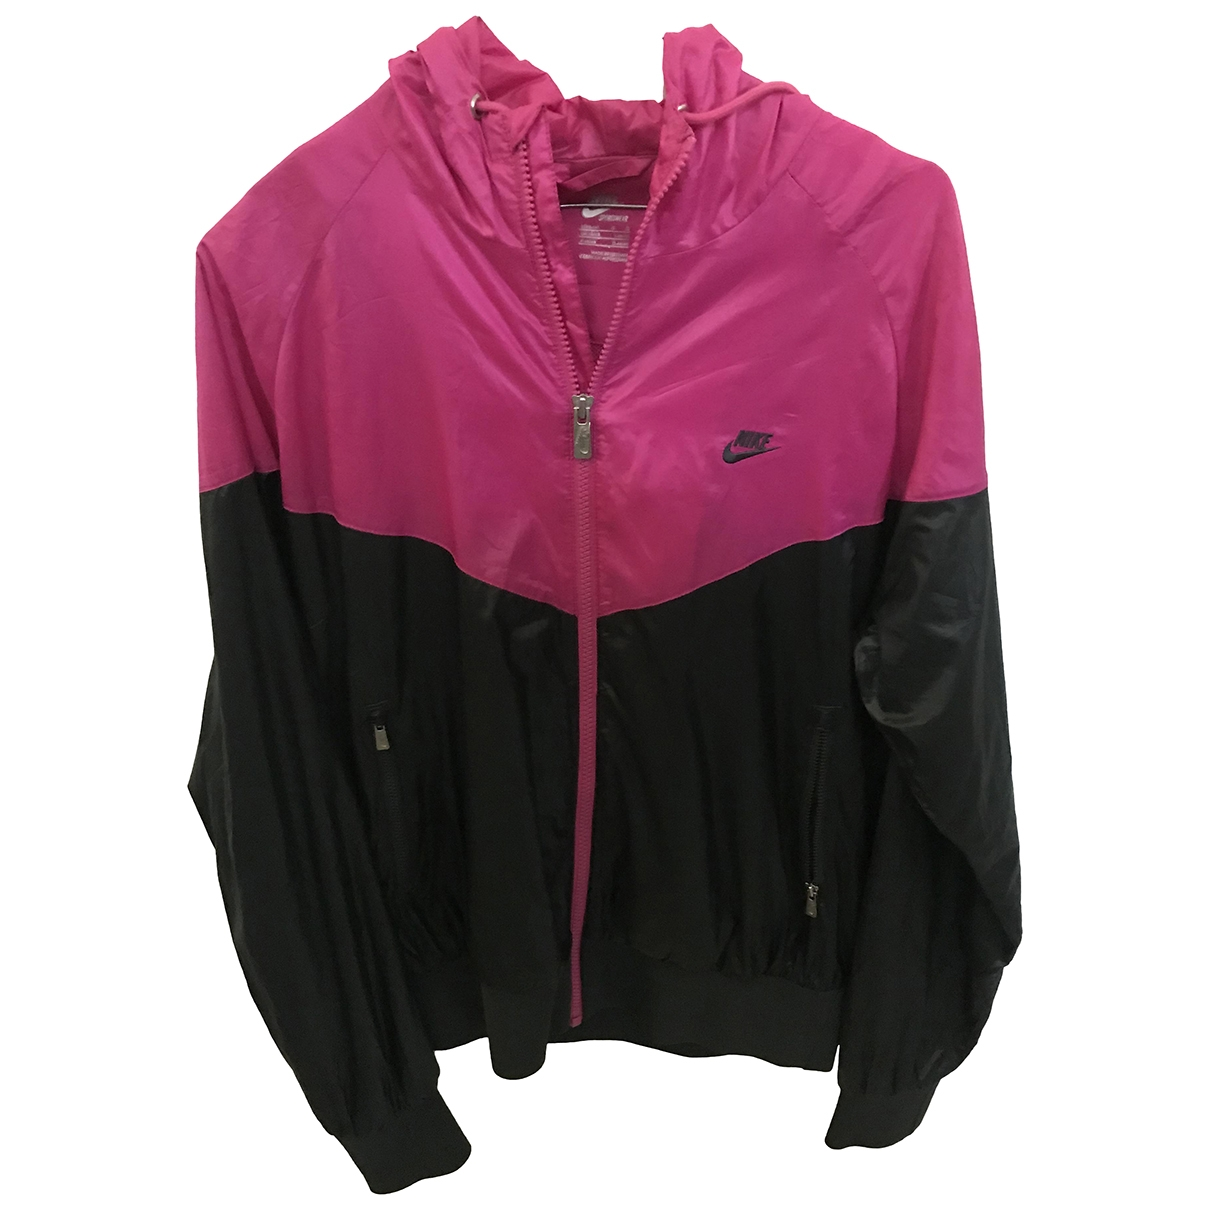 Nike \N Pink jacket  for Men S International